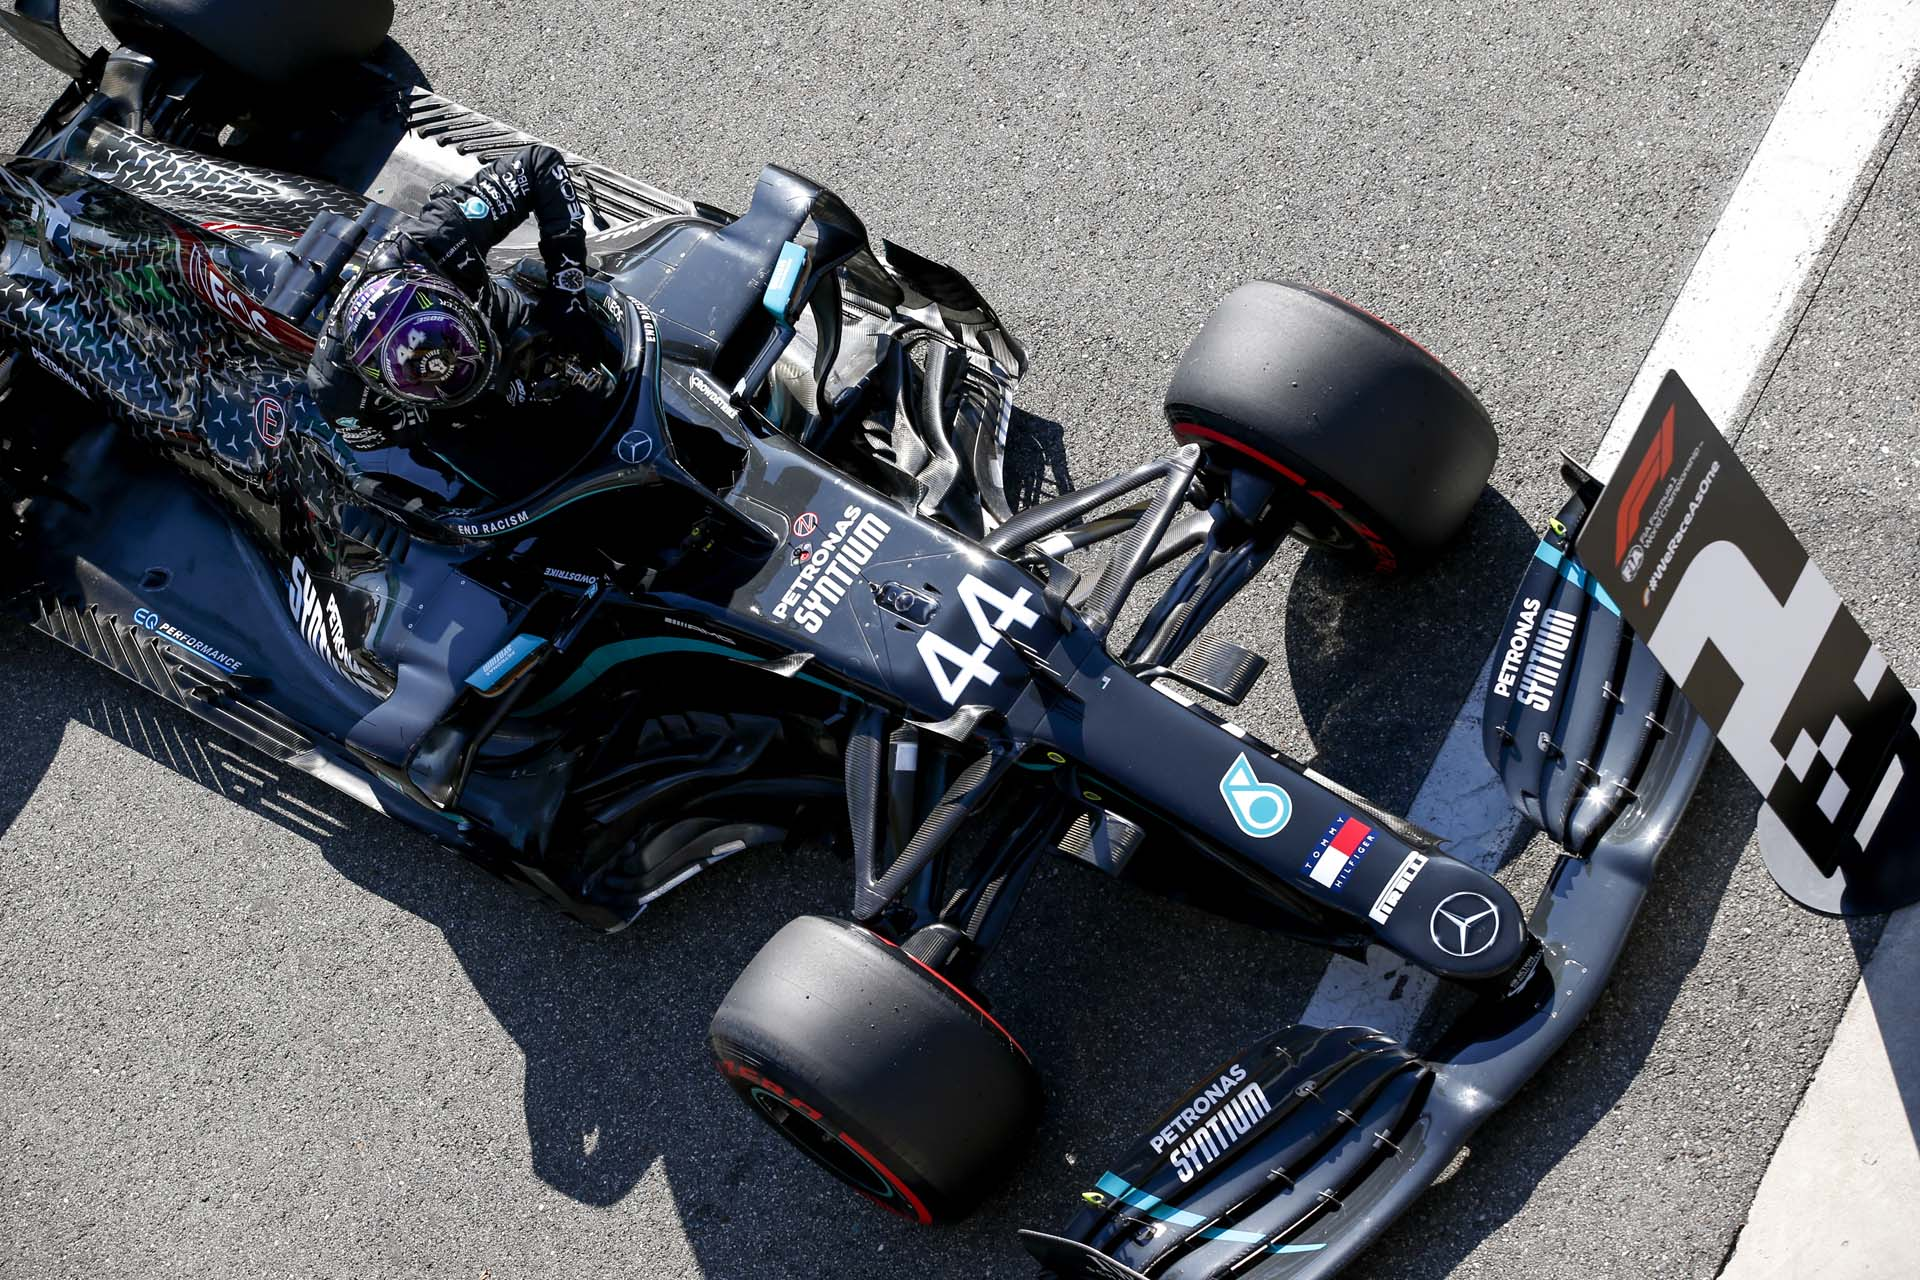 2020 Italian Grand Prix, Saturday - Wolfgang Wilhelm